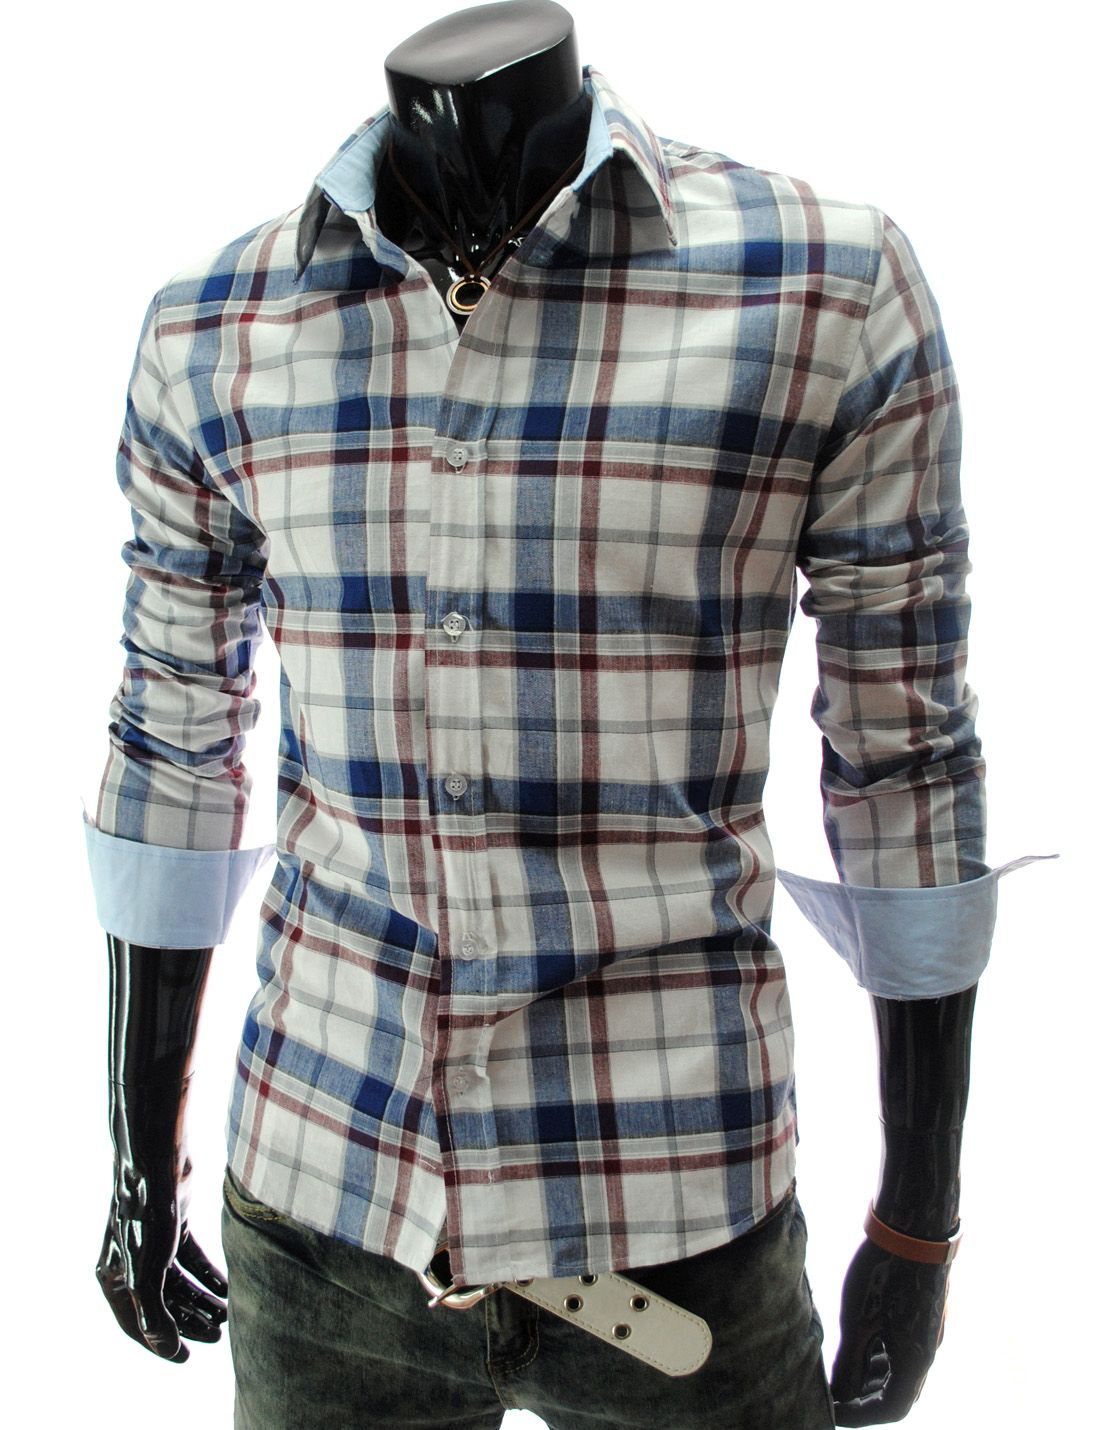 Flannel shirt and shorts men  Menus shirt  Threads  Pinterest  Clothes Menus fashion and Man style